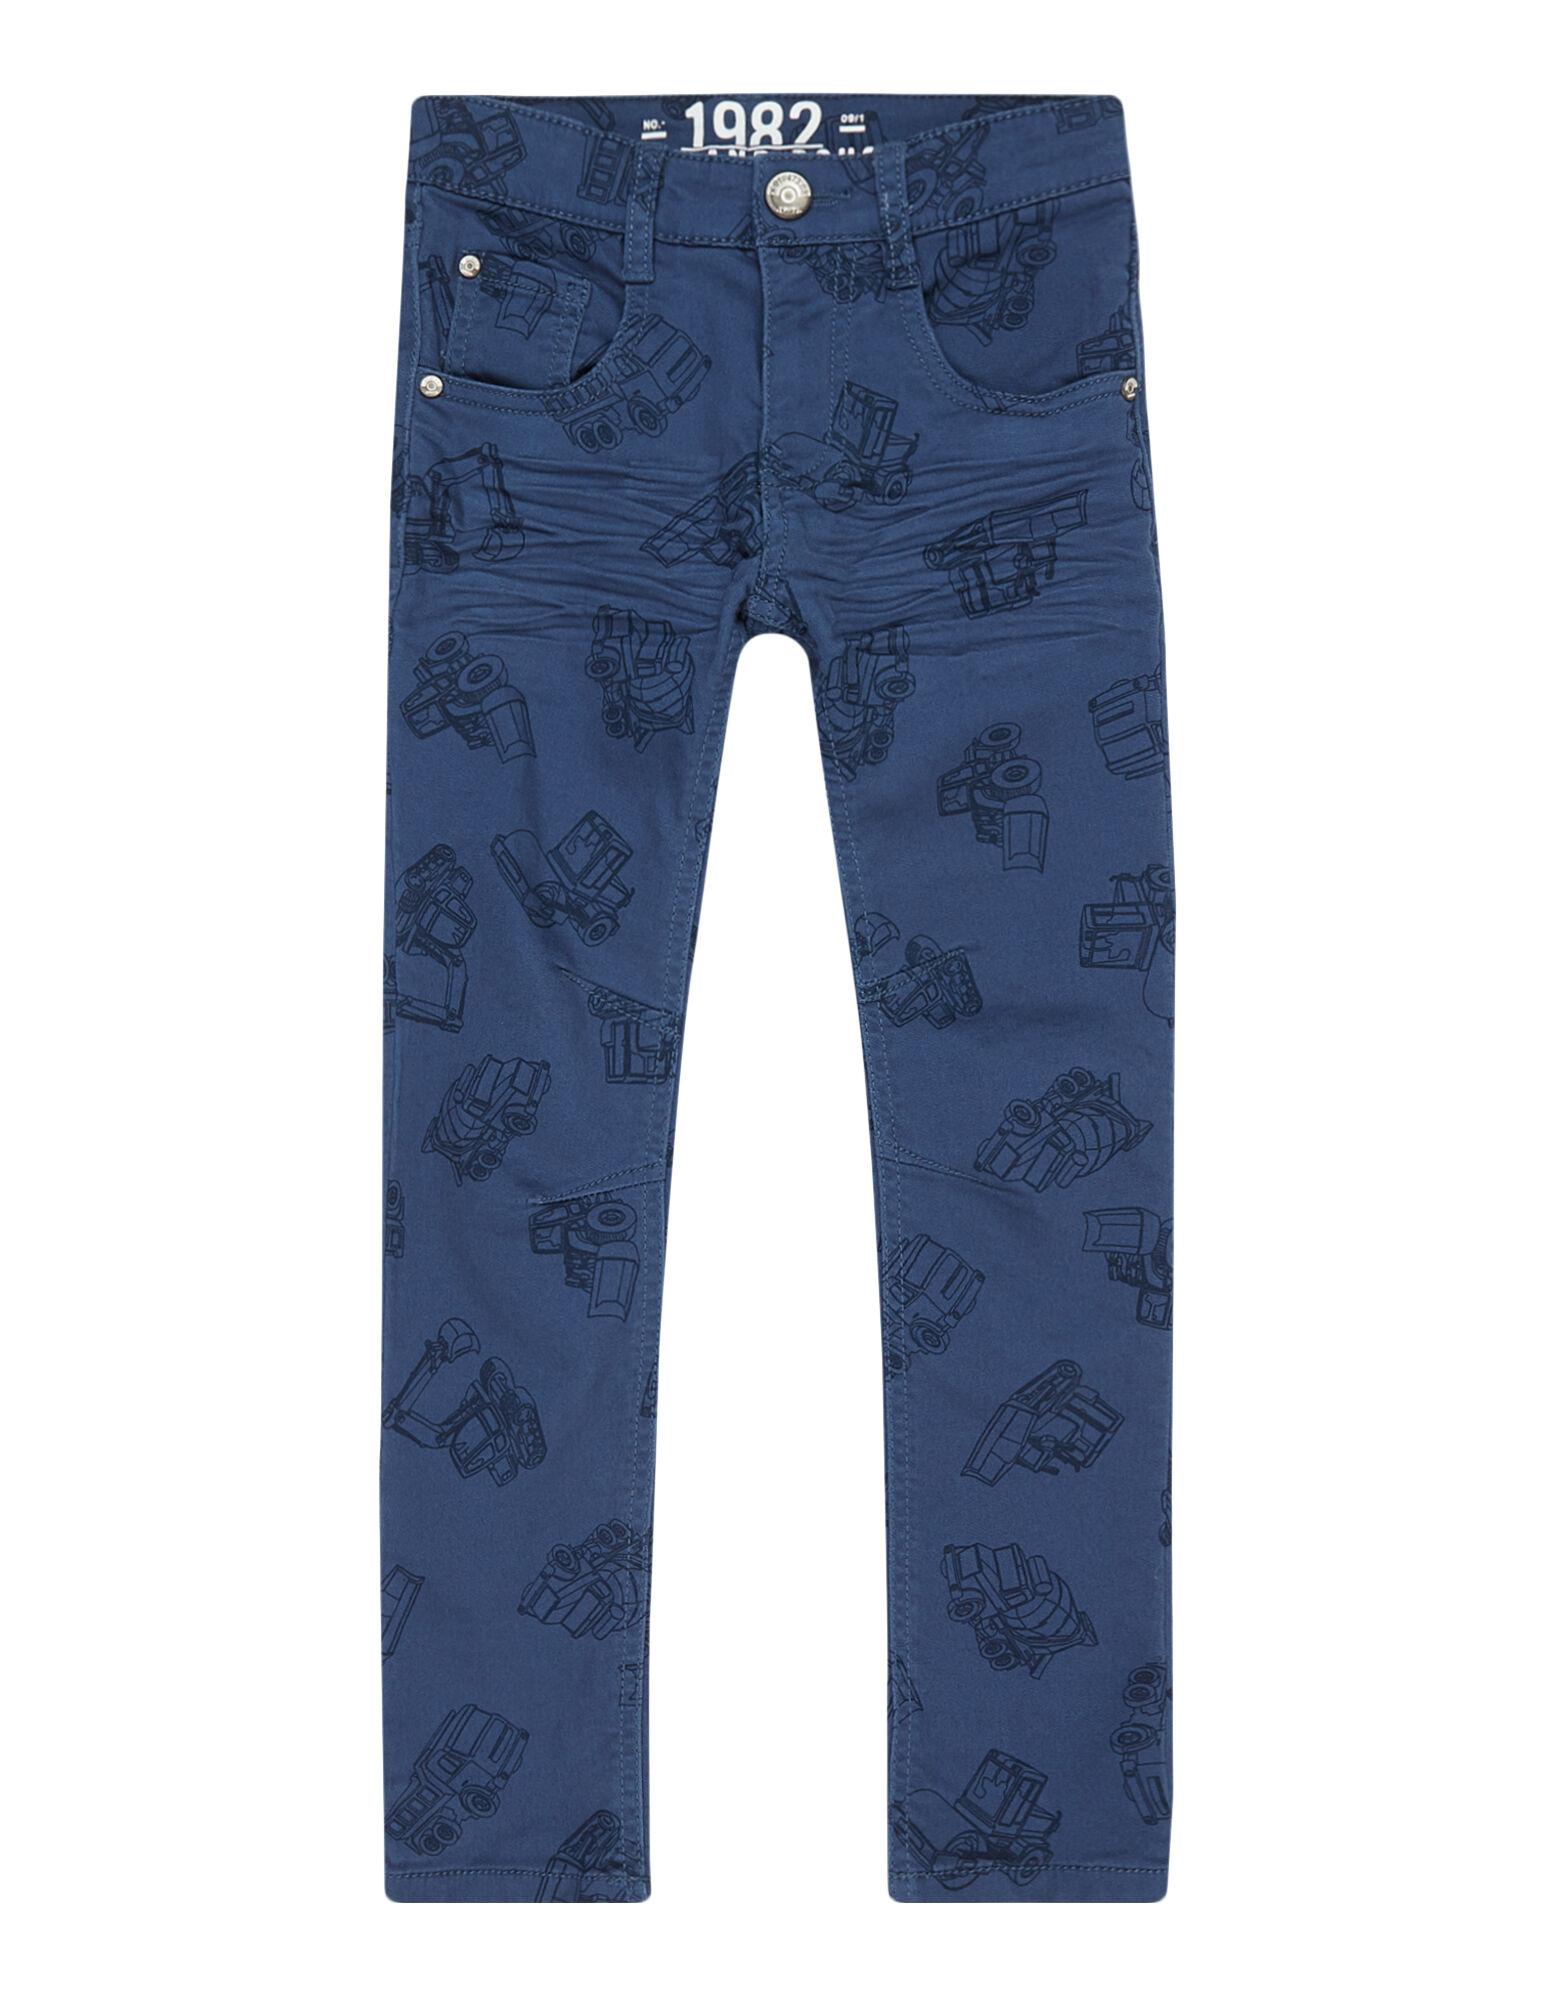 Jungen Skinny Fit Jeans aus Coloured Denim